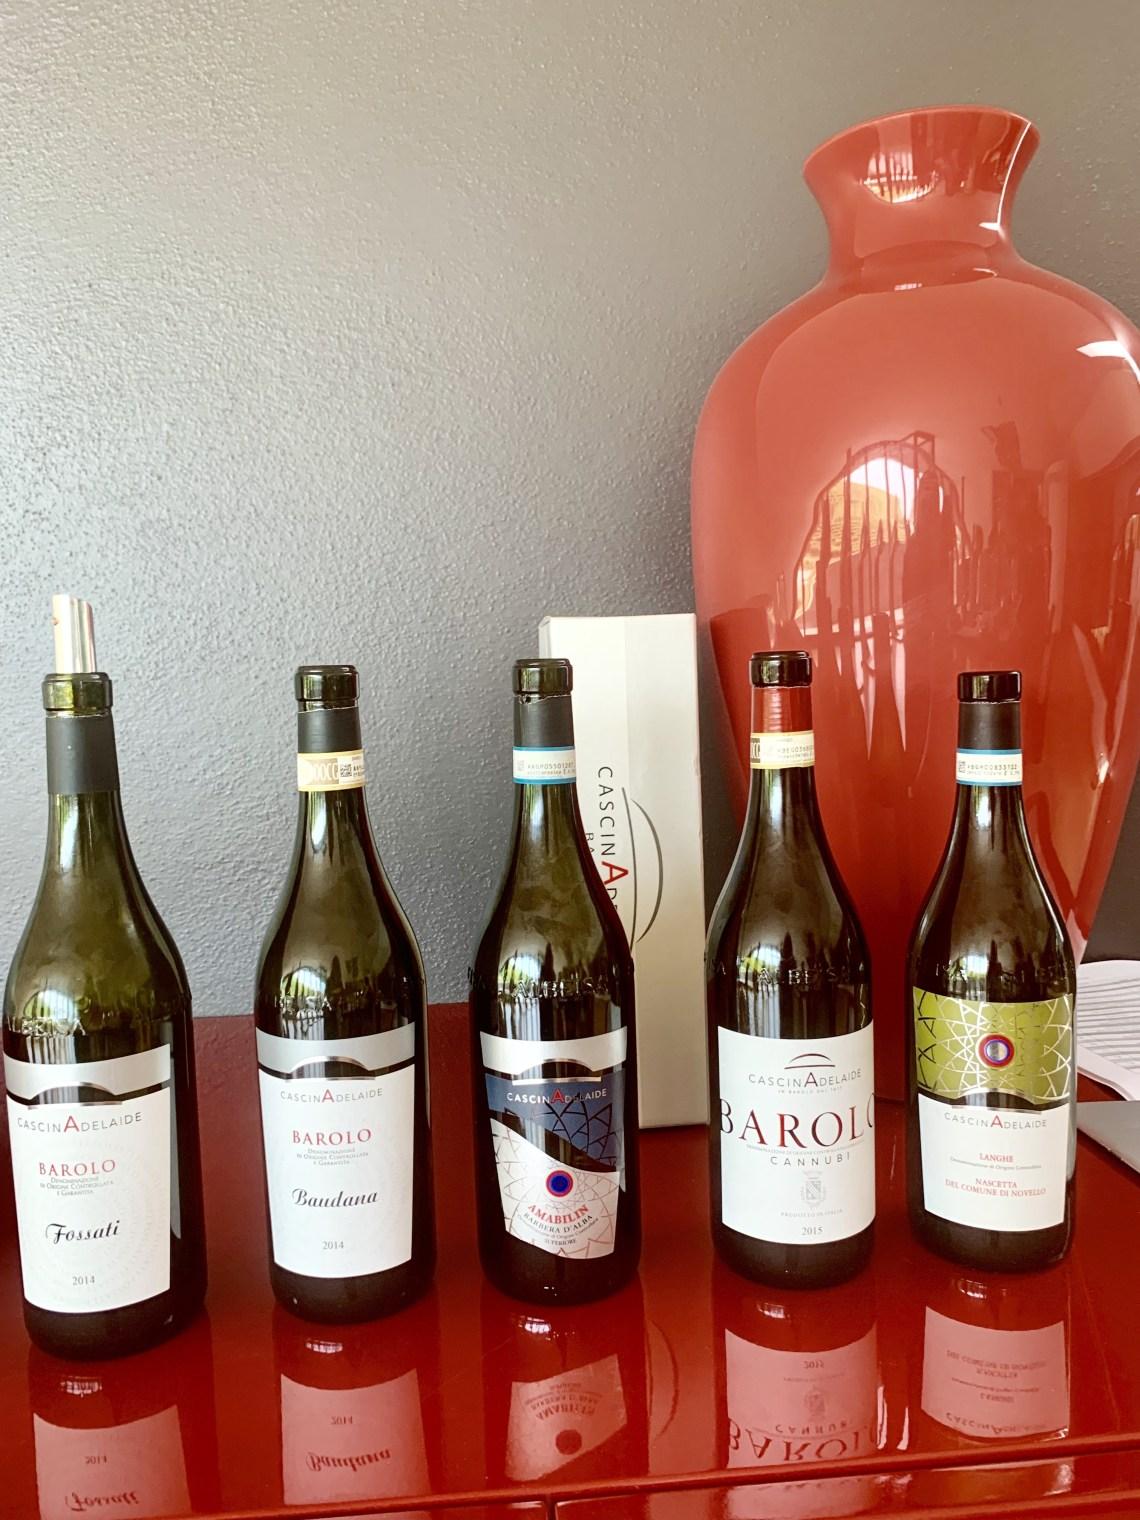 Piedmont Italy Barolo wine region_6337